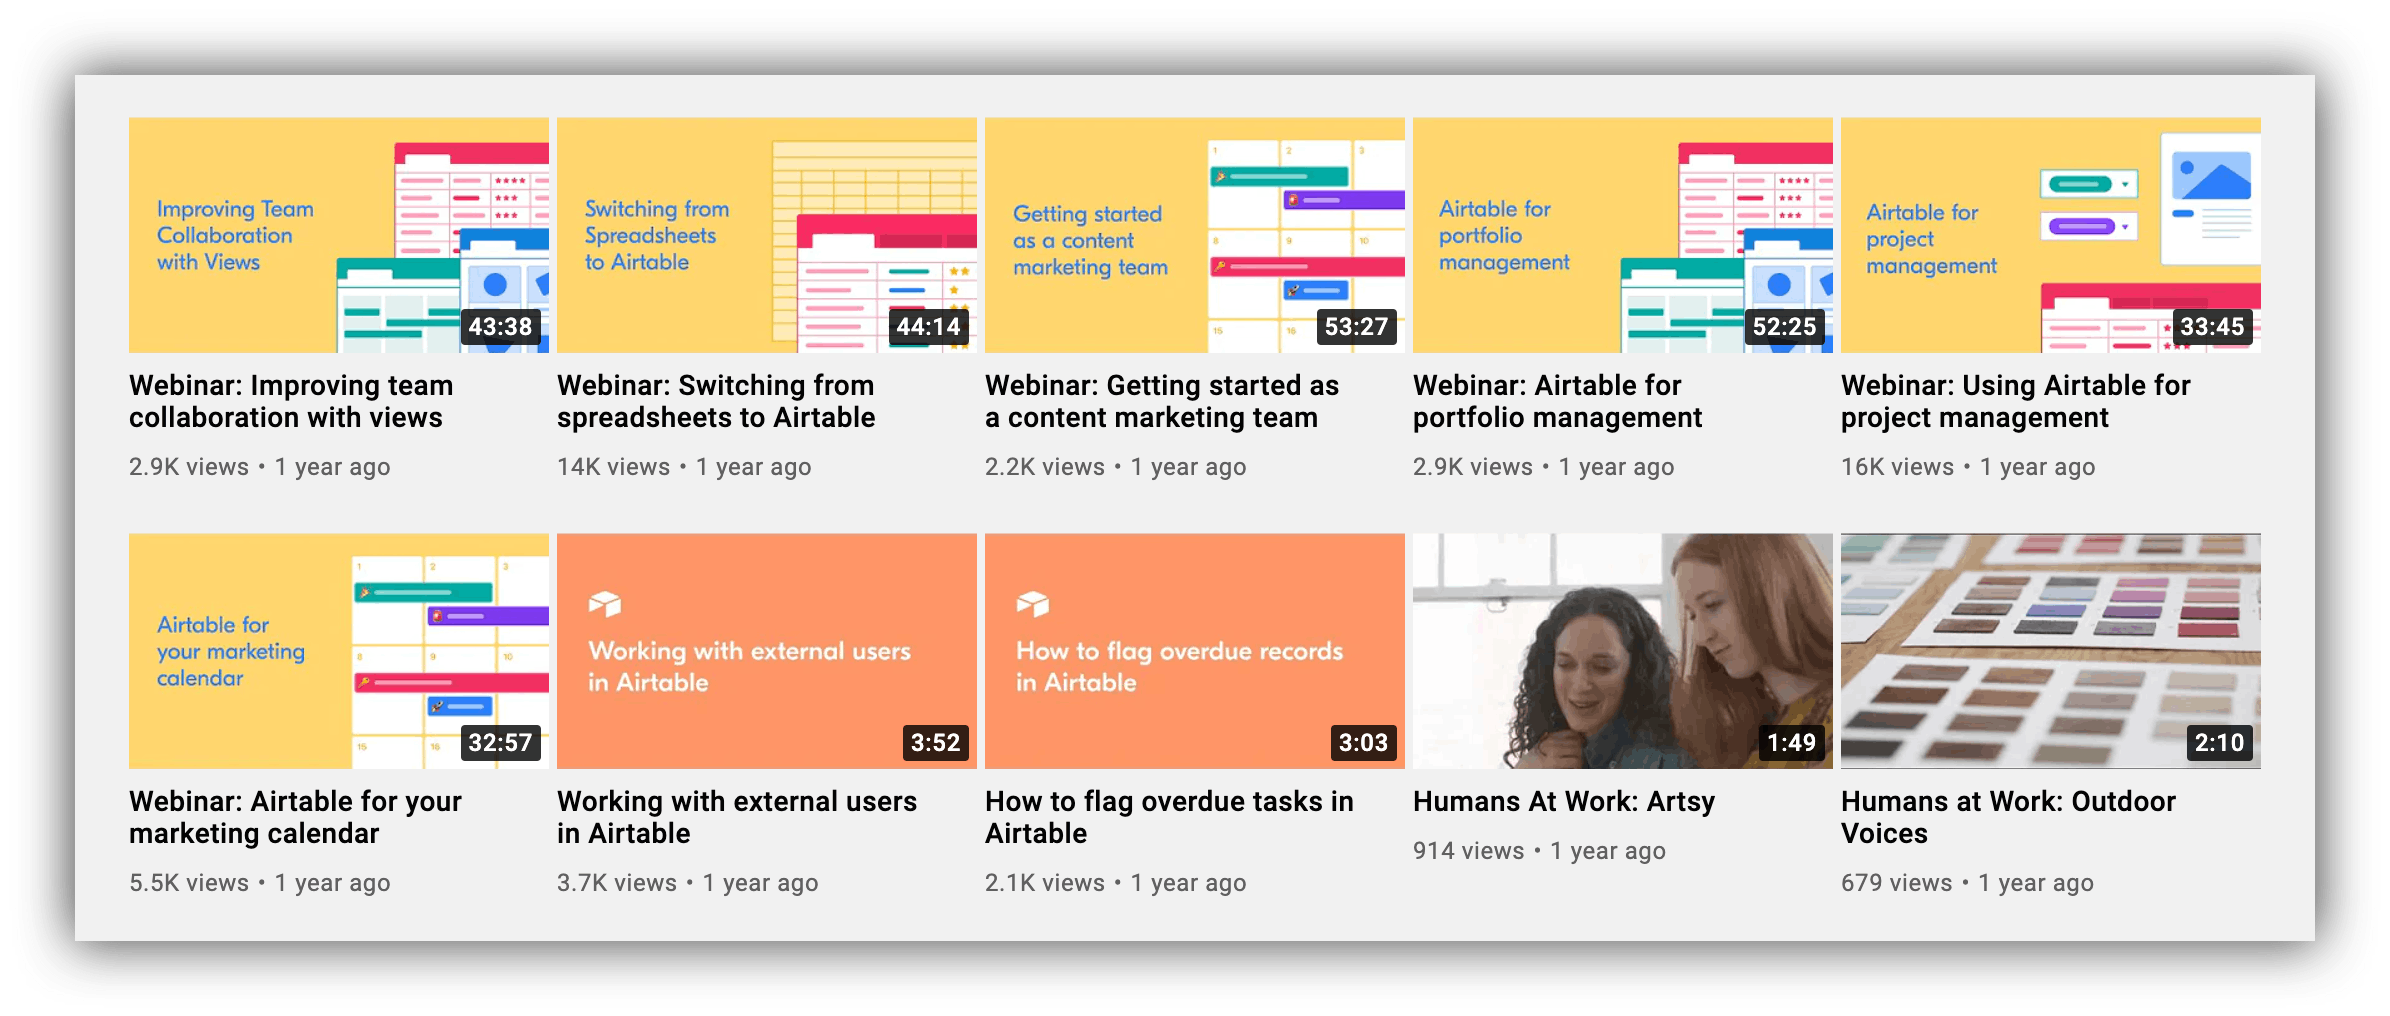 vimeo thumbnails example